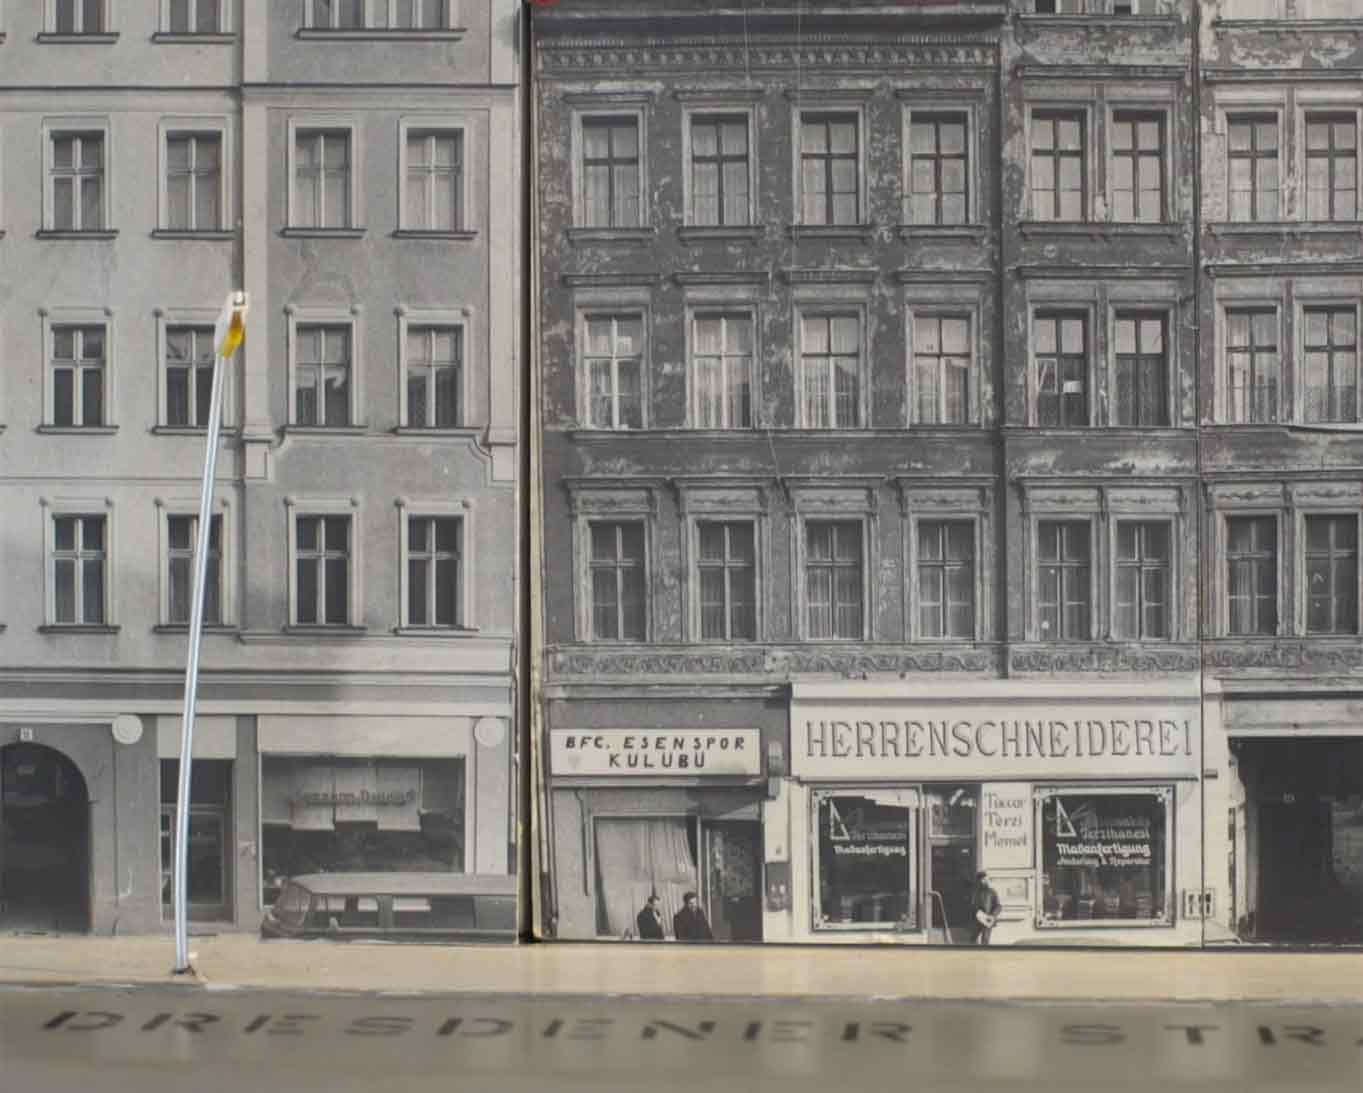 Dresdener-Strasse--Mit-offenem-Blick